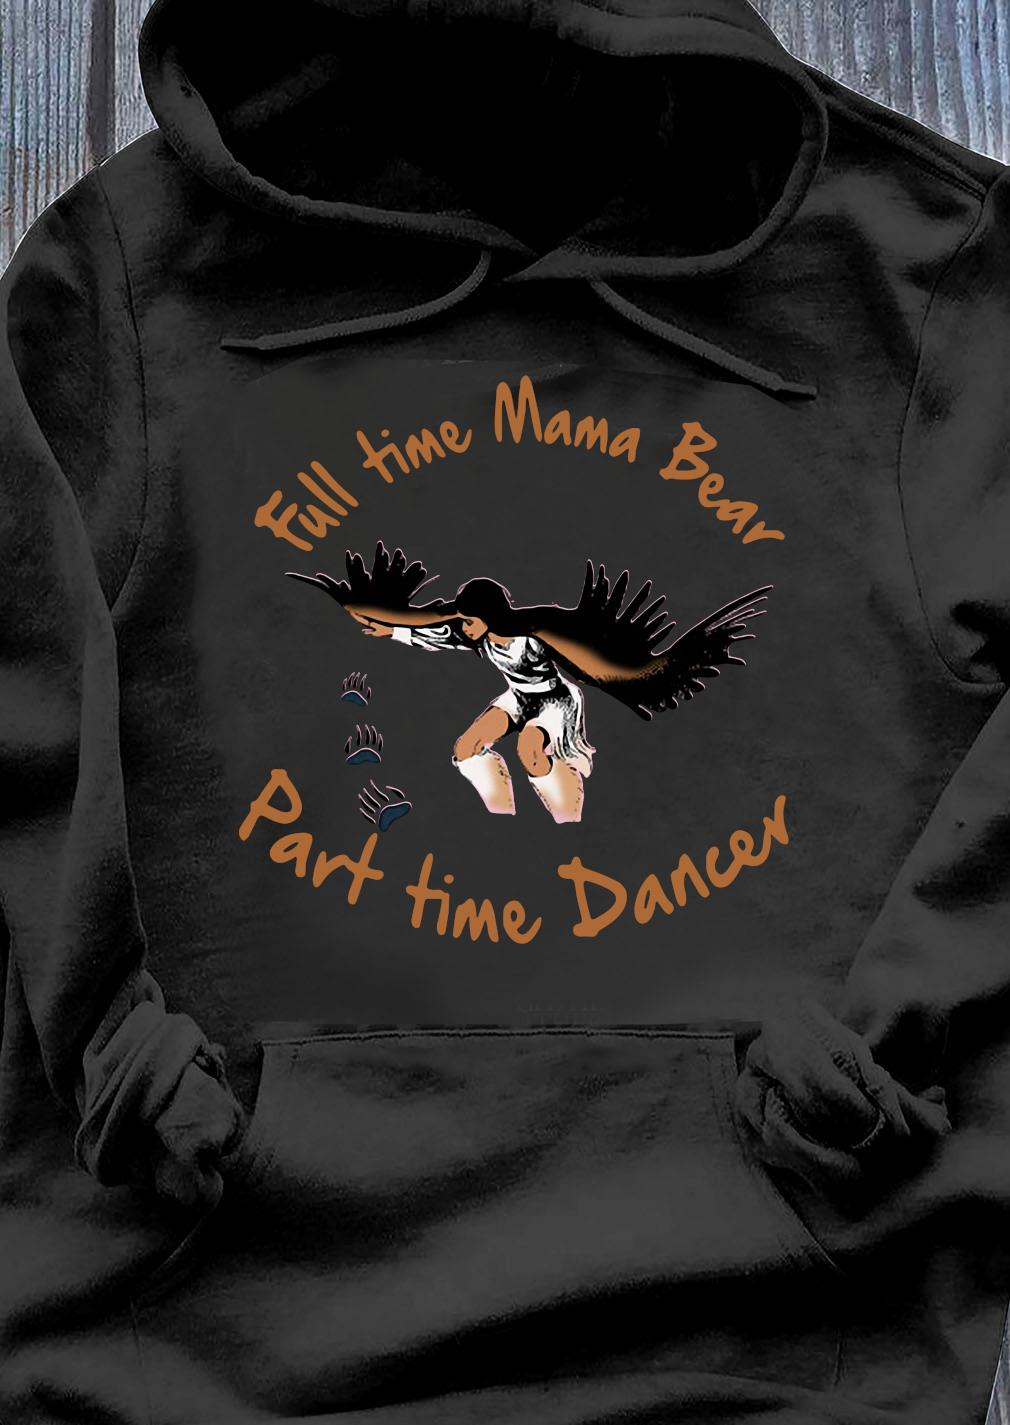 Full Time Mama Bear Part Time Dancer Shirt Hoodie